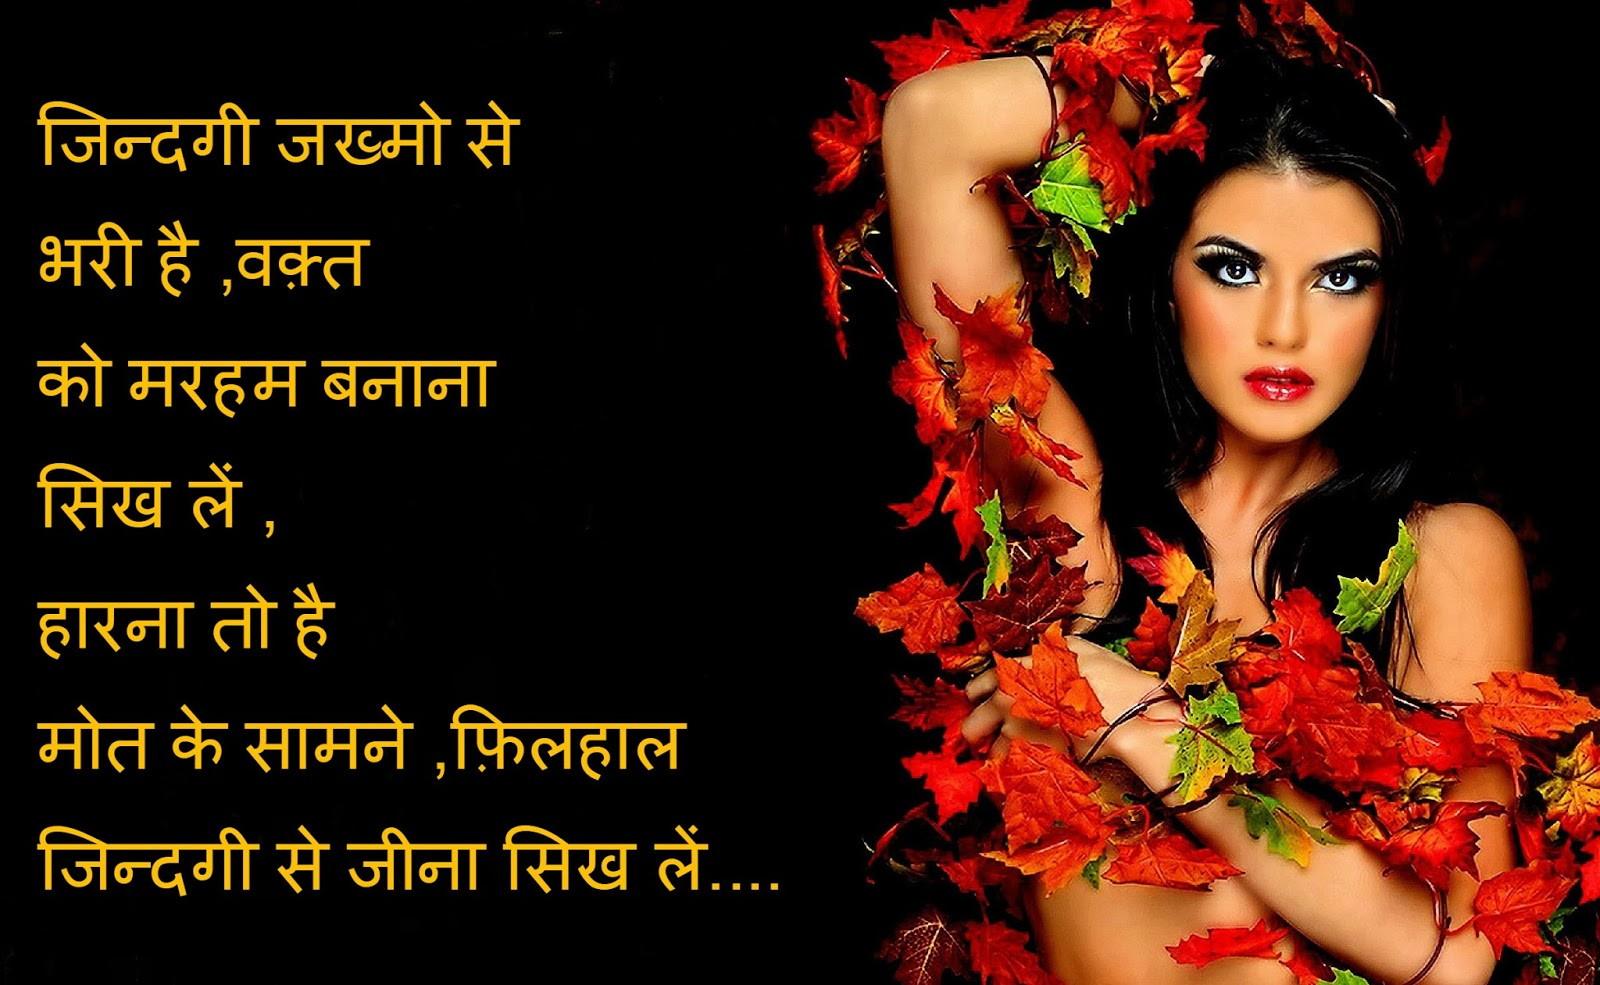 Suvichar hindi shayari download - www knavhnfzlo ml